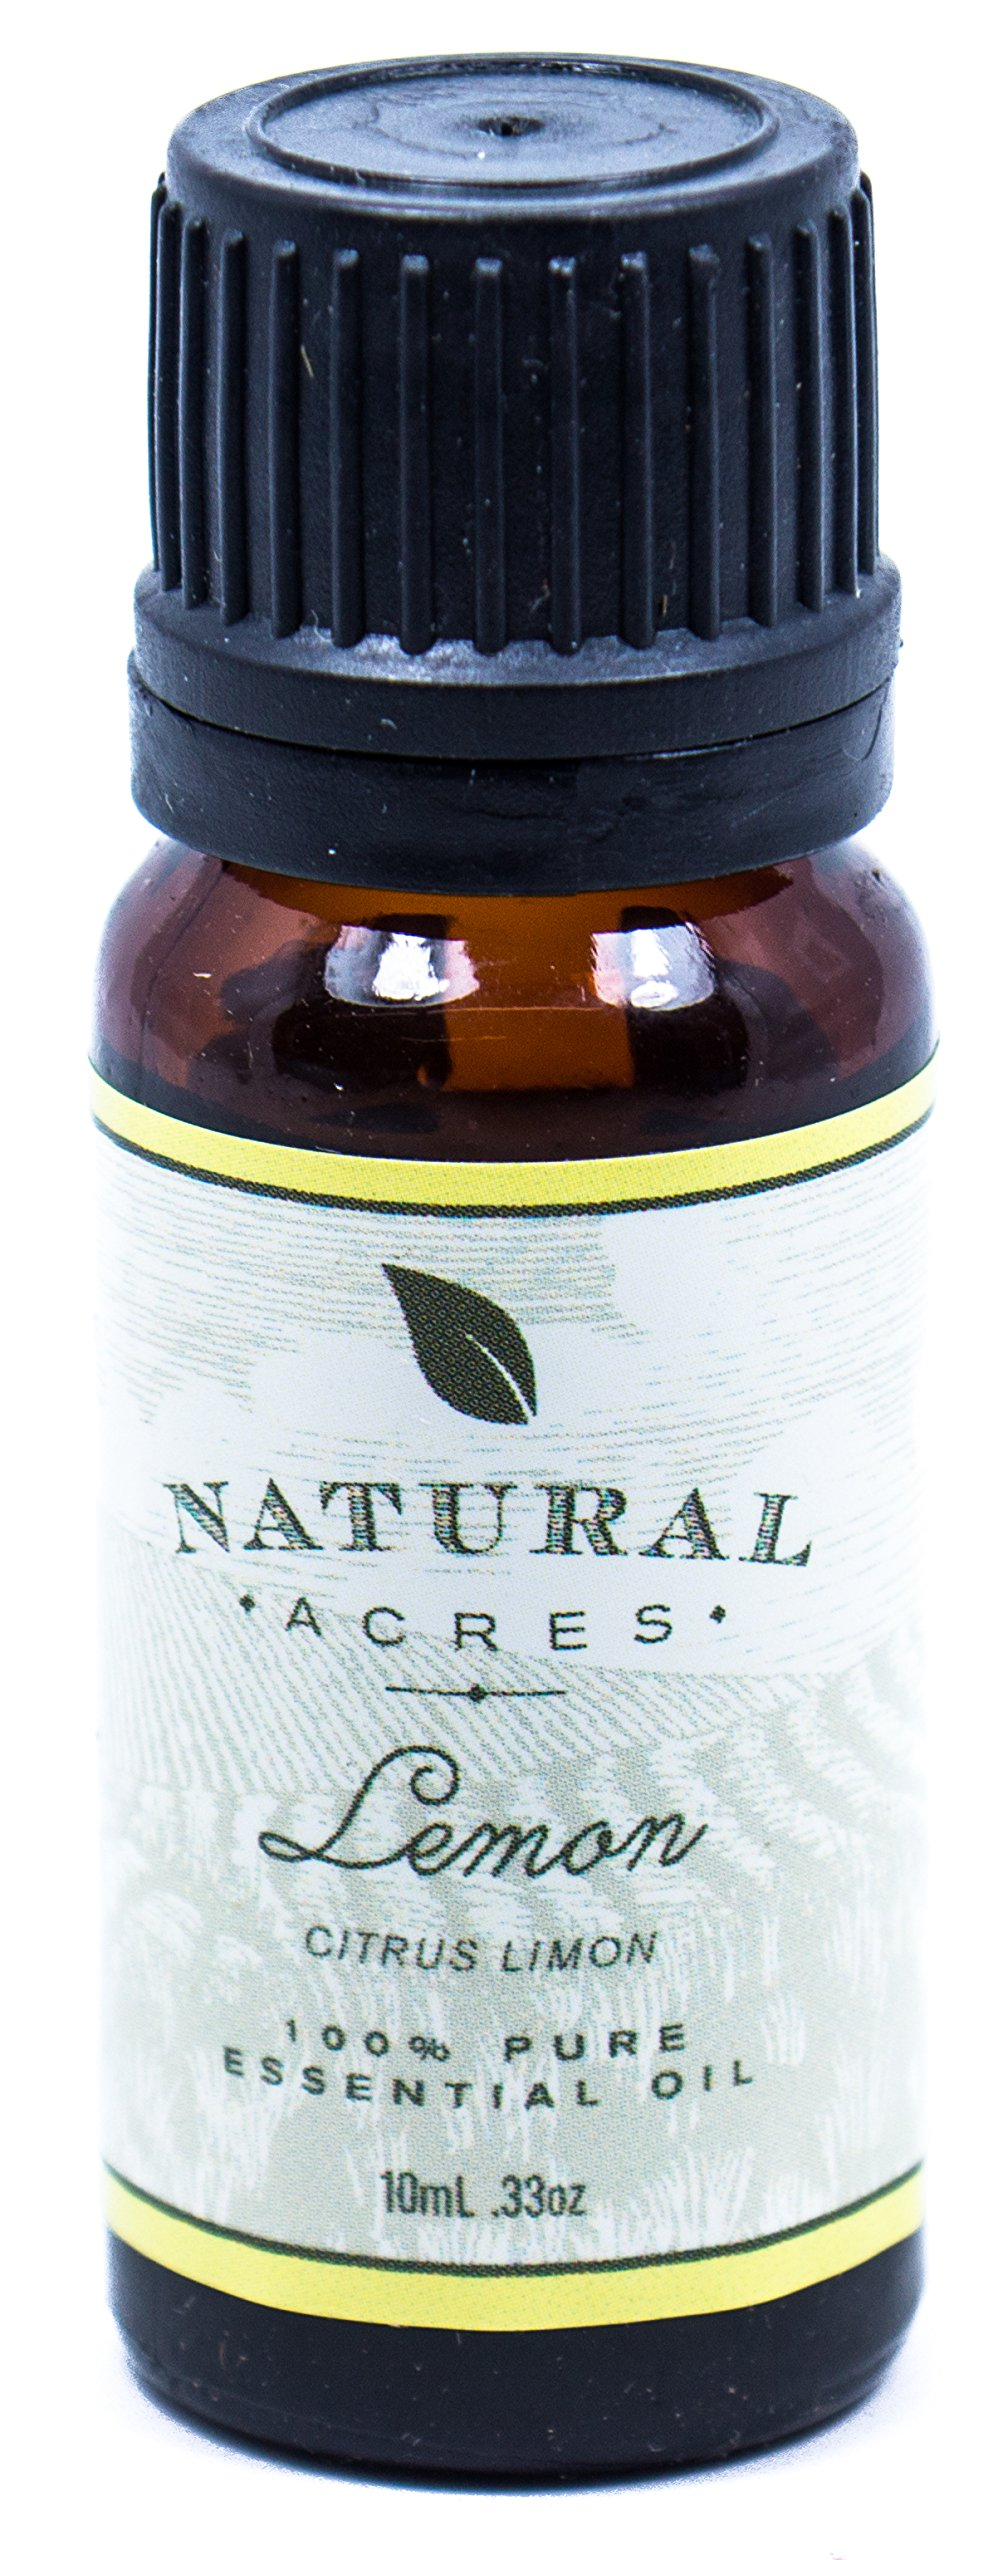 Lemon Essential Oil - 100% Pure Therapeutic Grade Lemon Oil by Natural Acres - 10ml